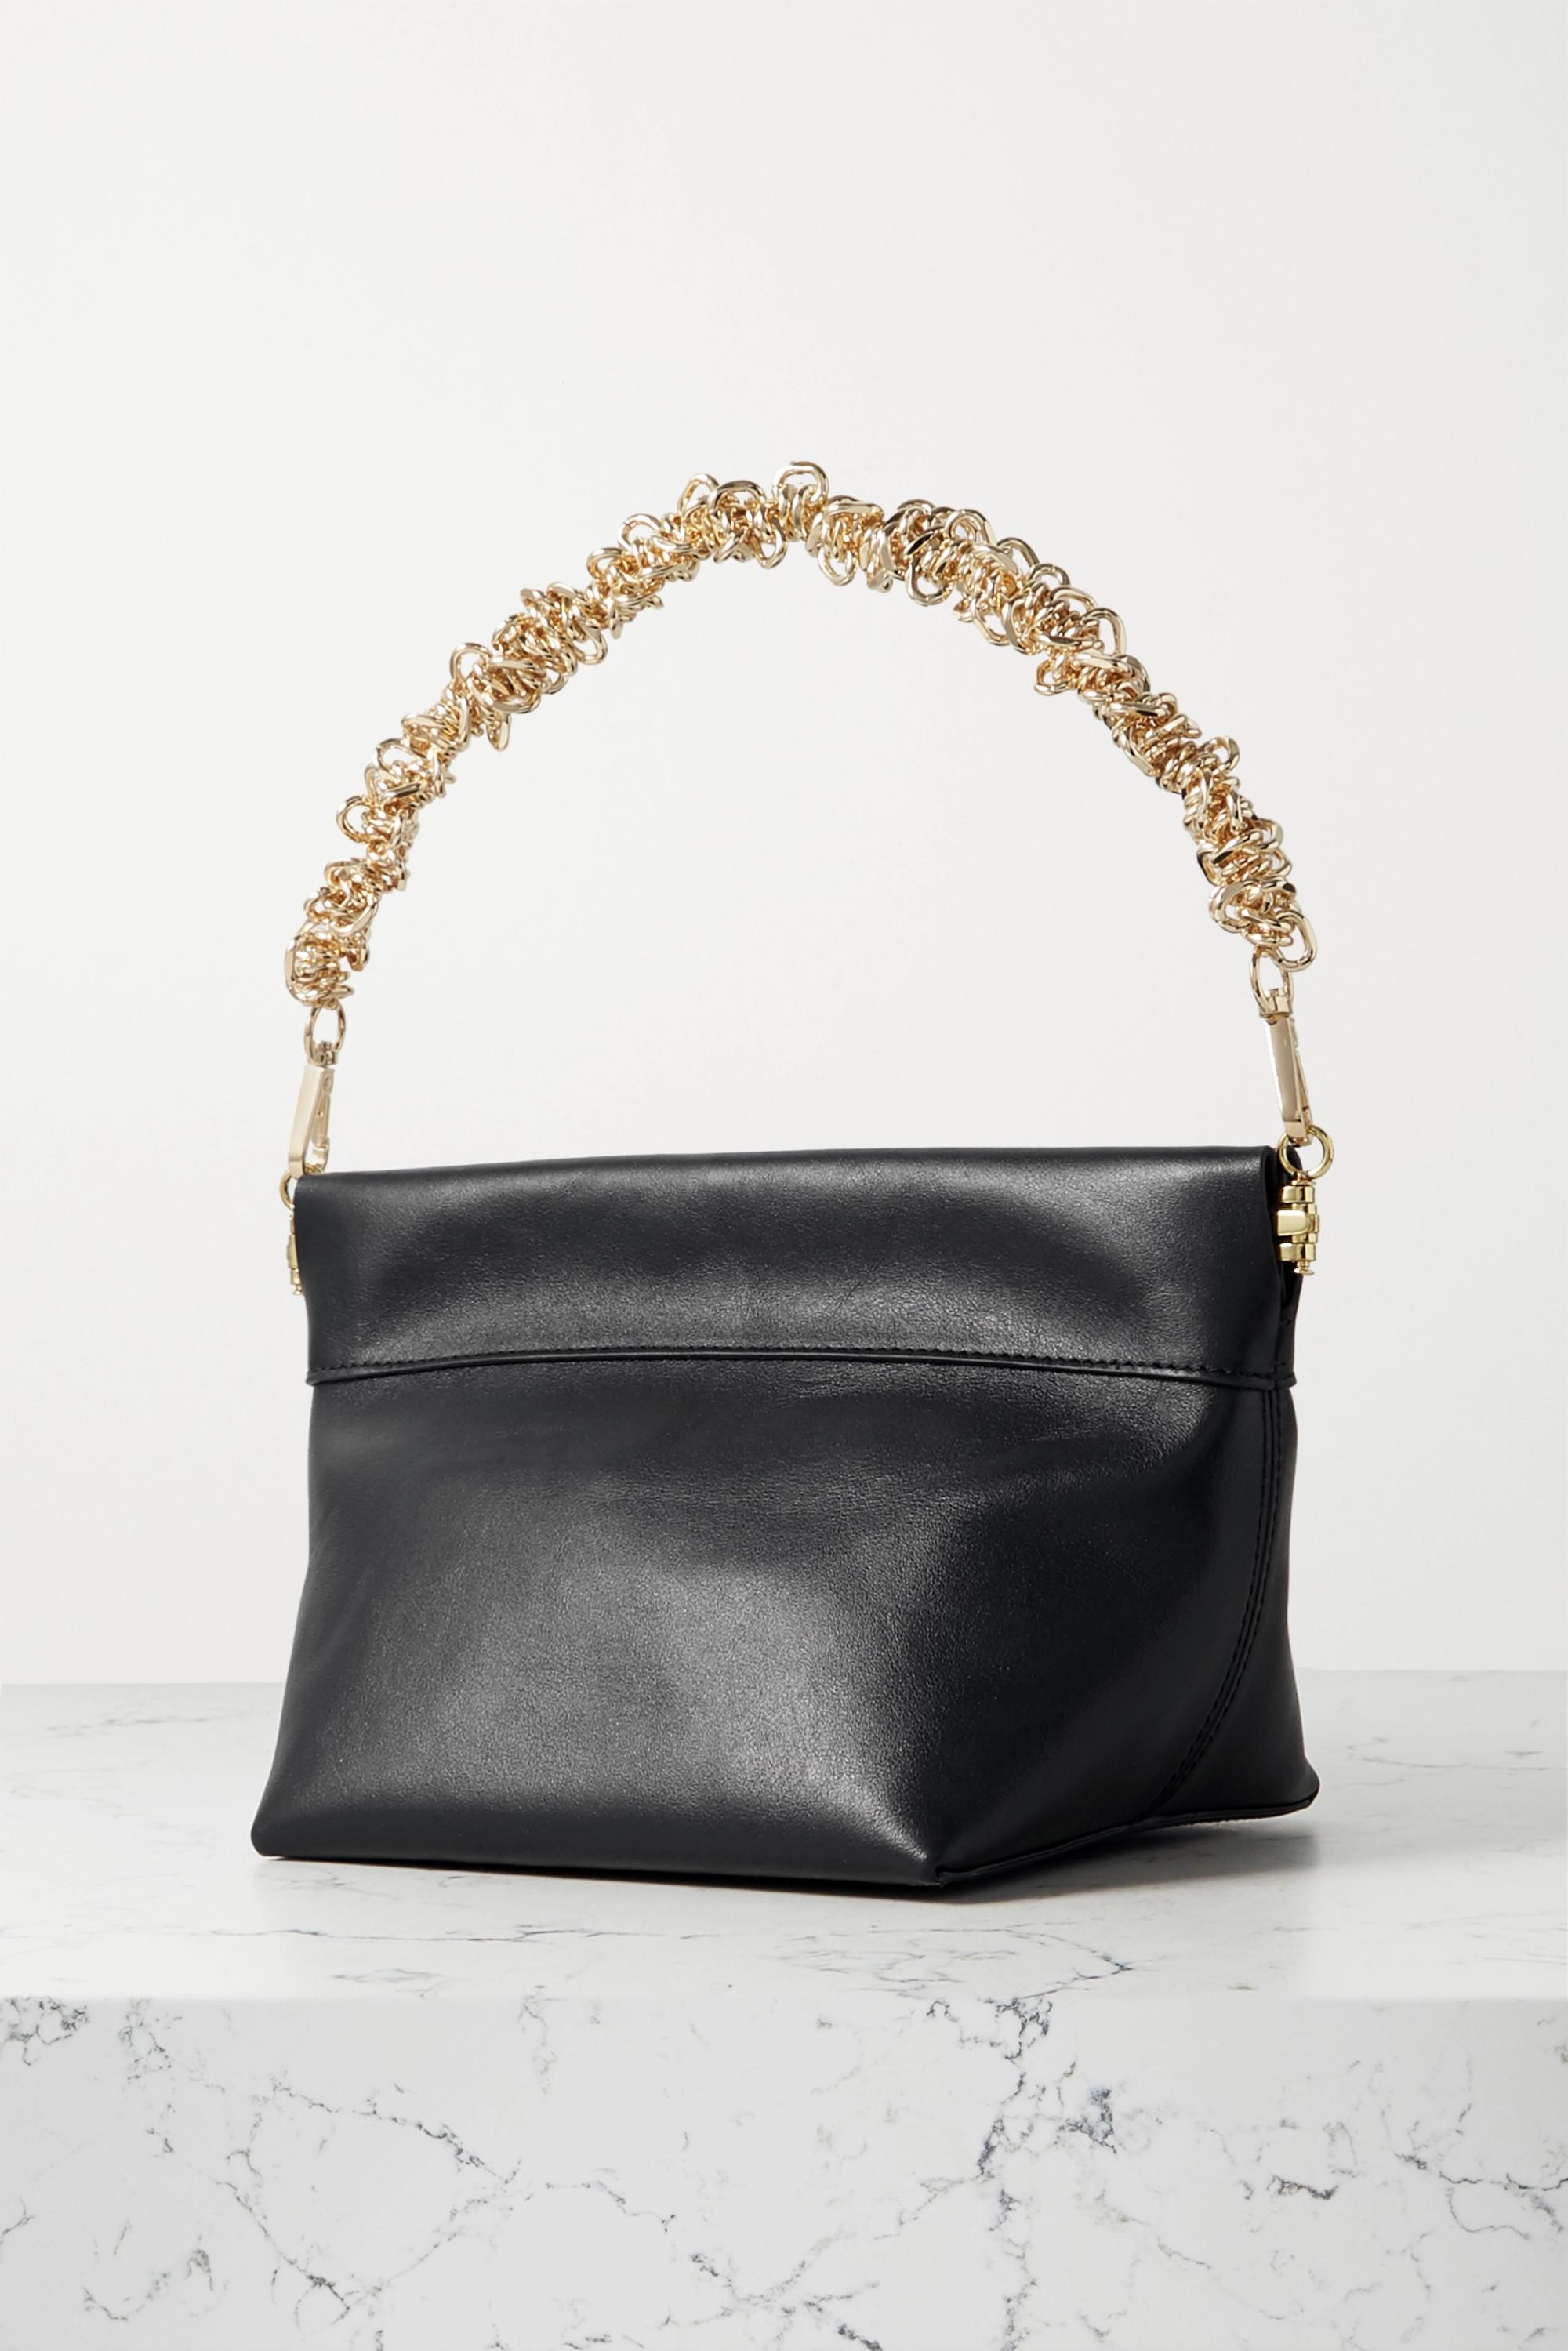 Yuzefi Leather tote